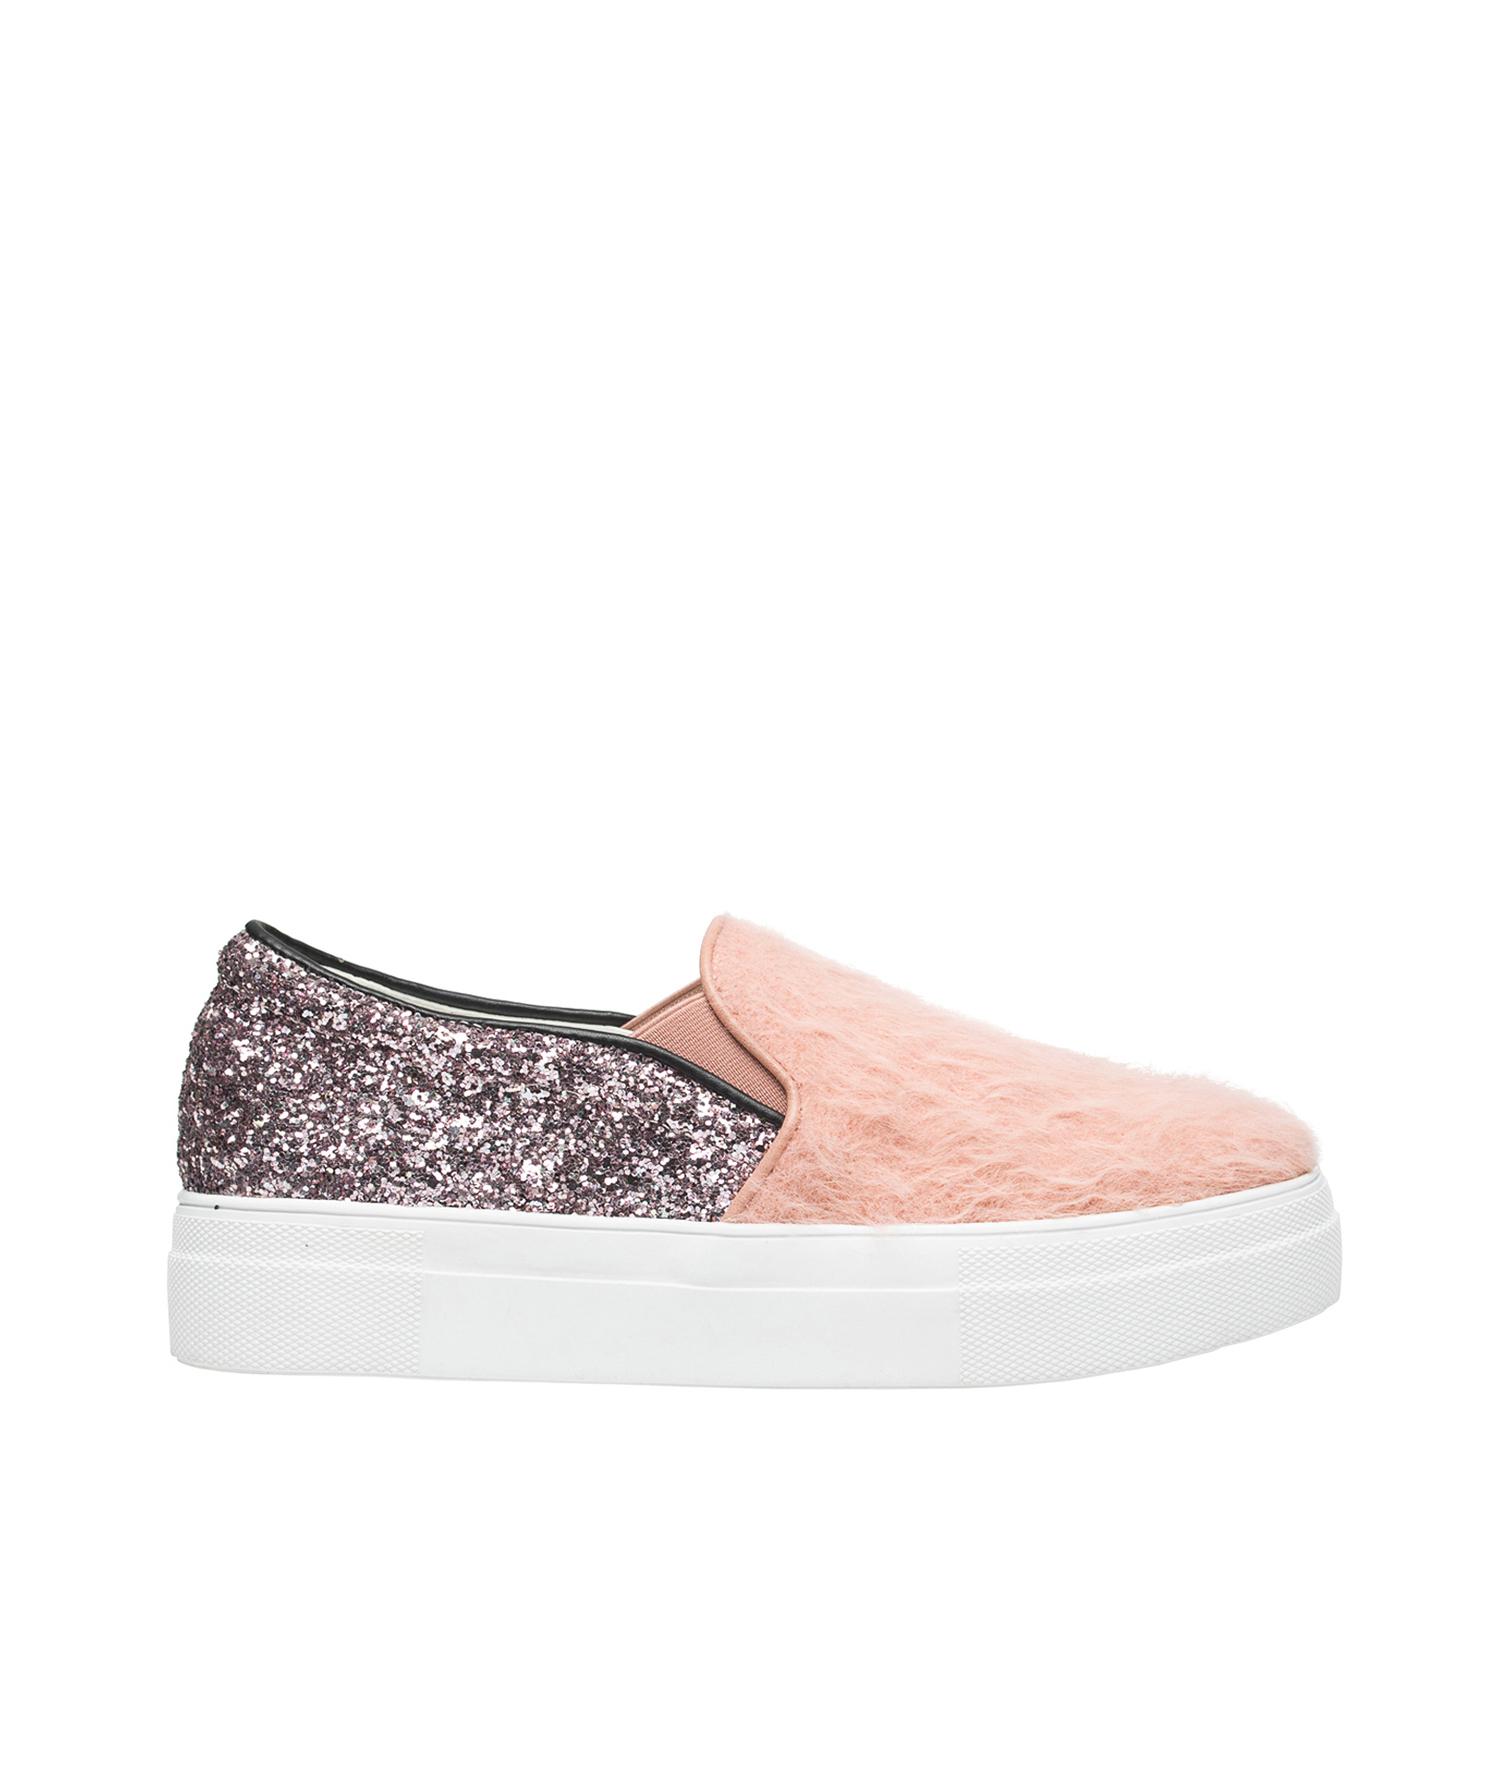 AnnaKastle Womens Glitter Trimmed Angora Slip On Sneakers Pink ab3467c9b